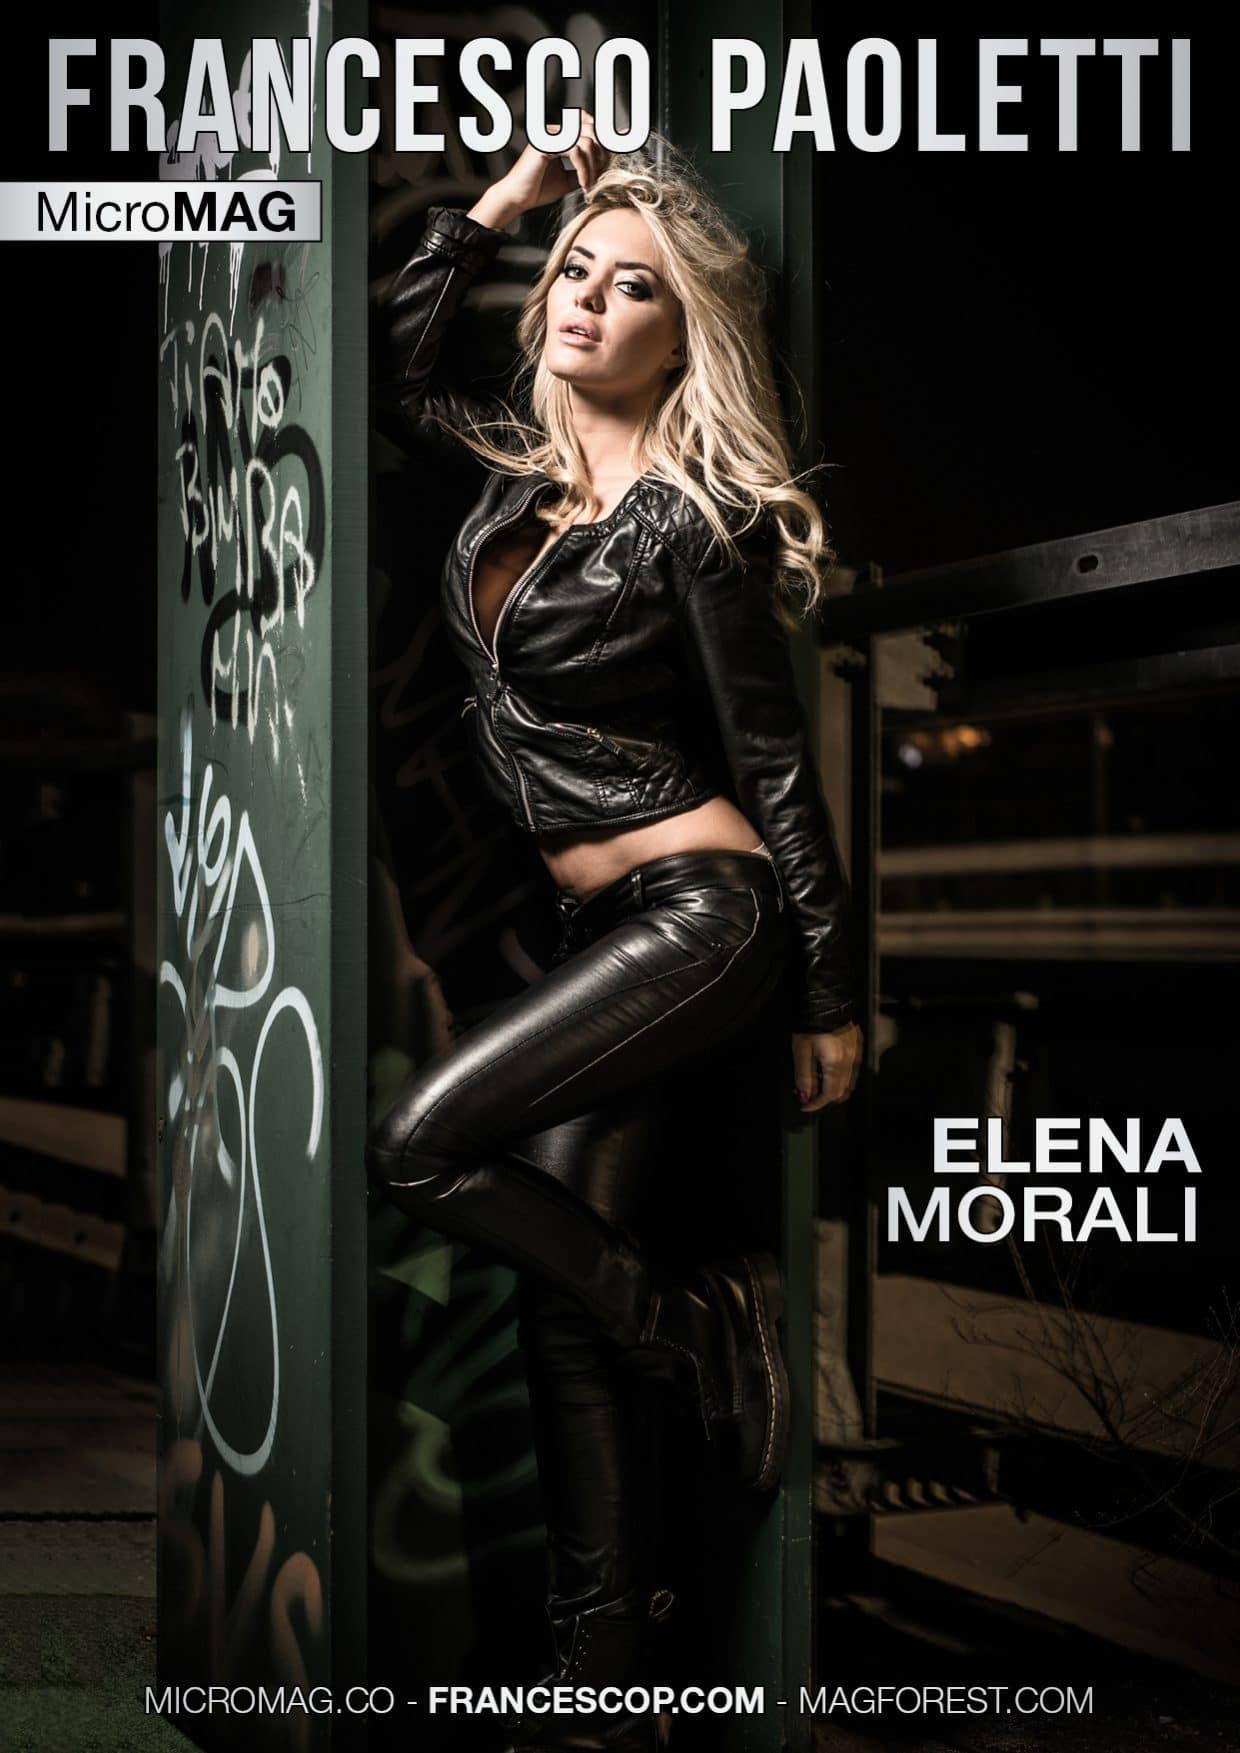 Francesco Paoletti MicroMAG - Elena Morali 1